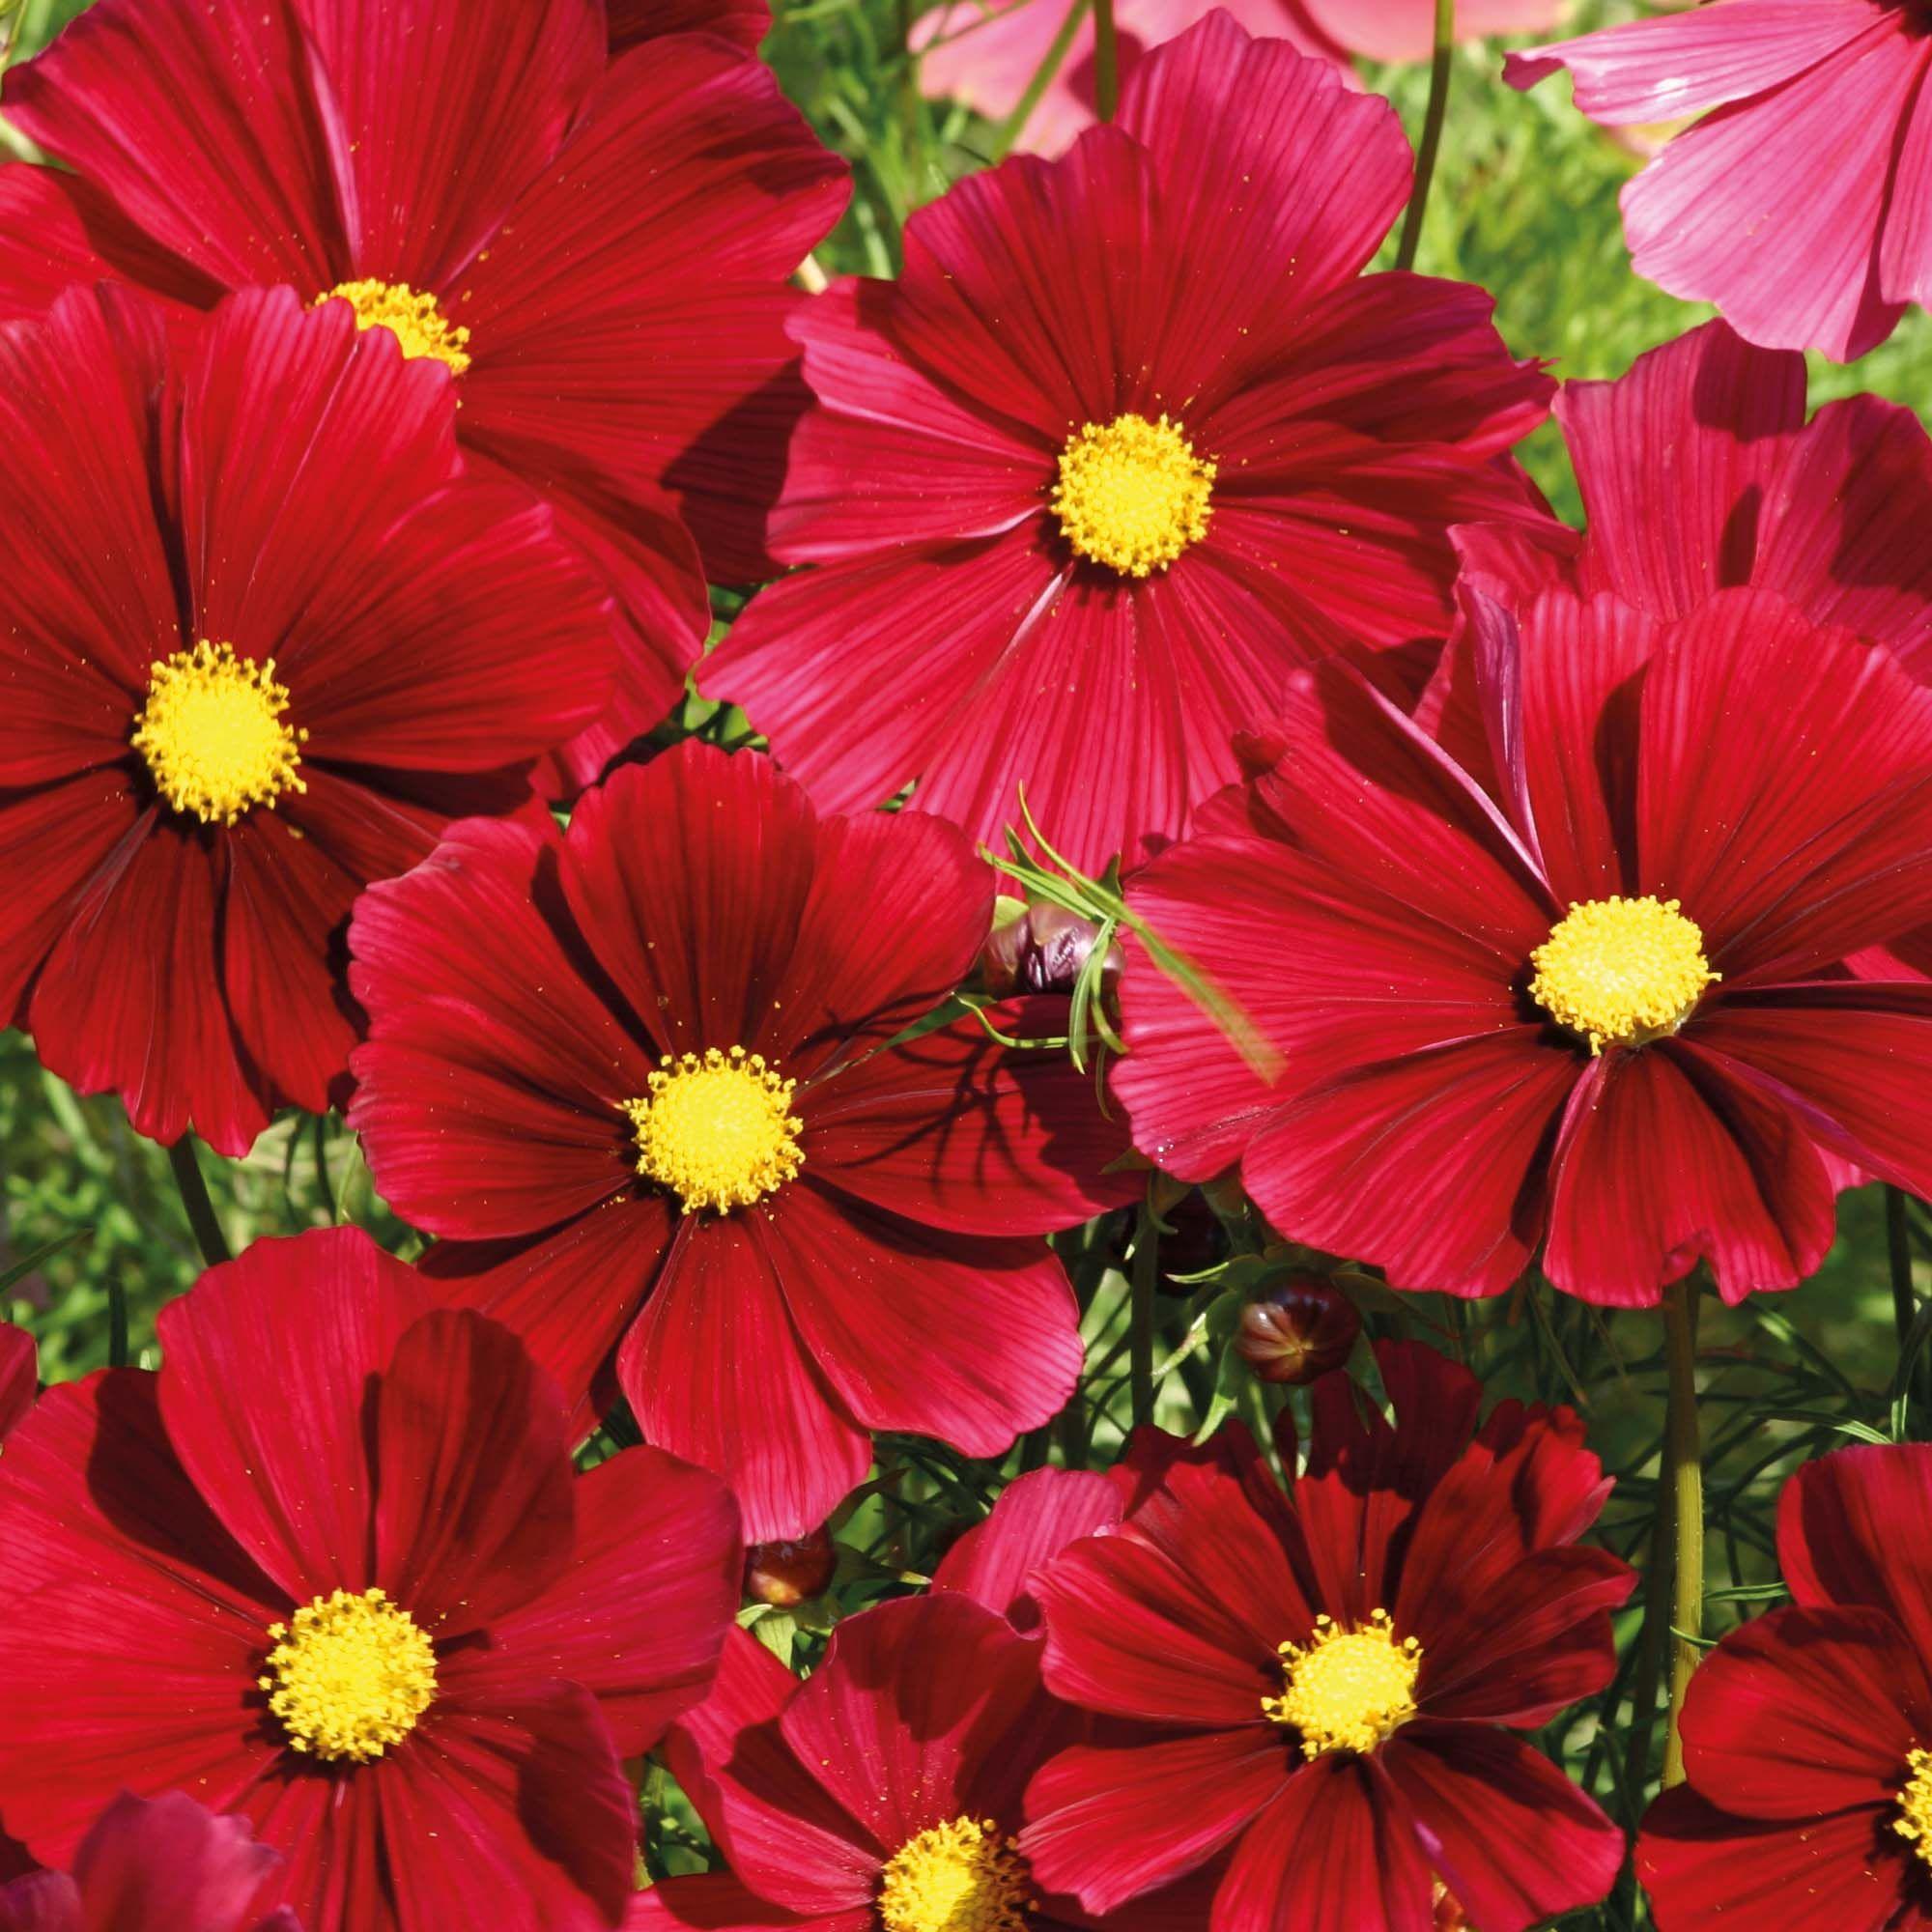 Cosmos bipinnatus rubenza cosmos seeds and gardens cosmos bipinnatus rubenza half hardy annual seeds thompson izmirmasajfo Gallery